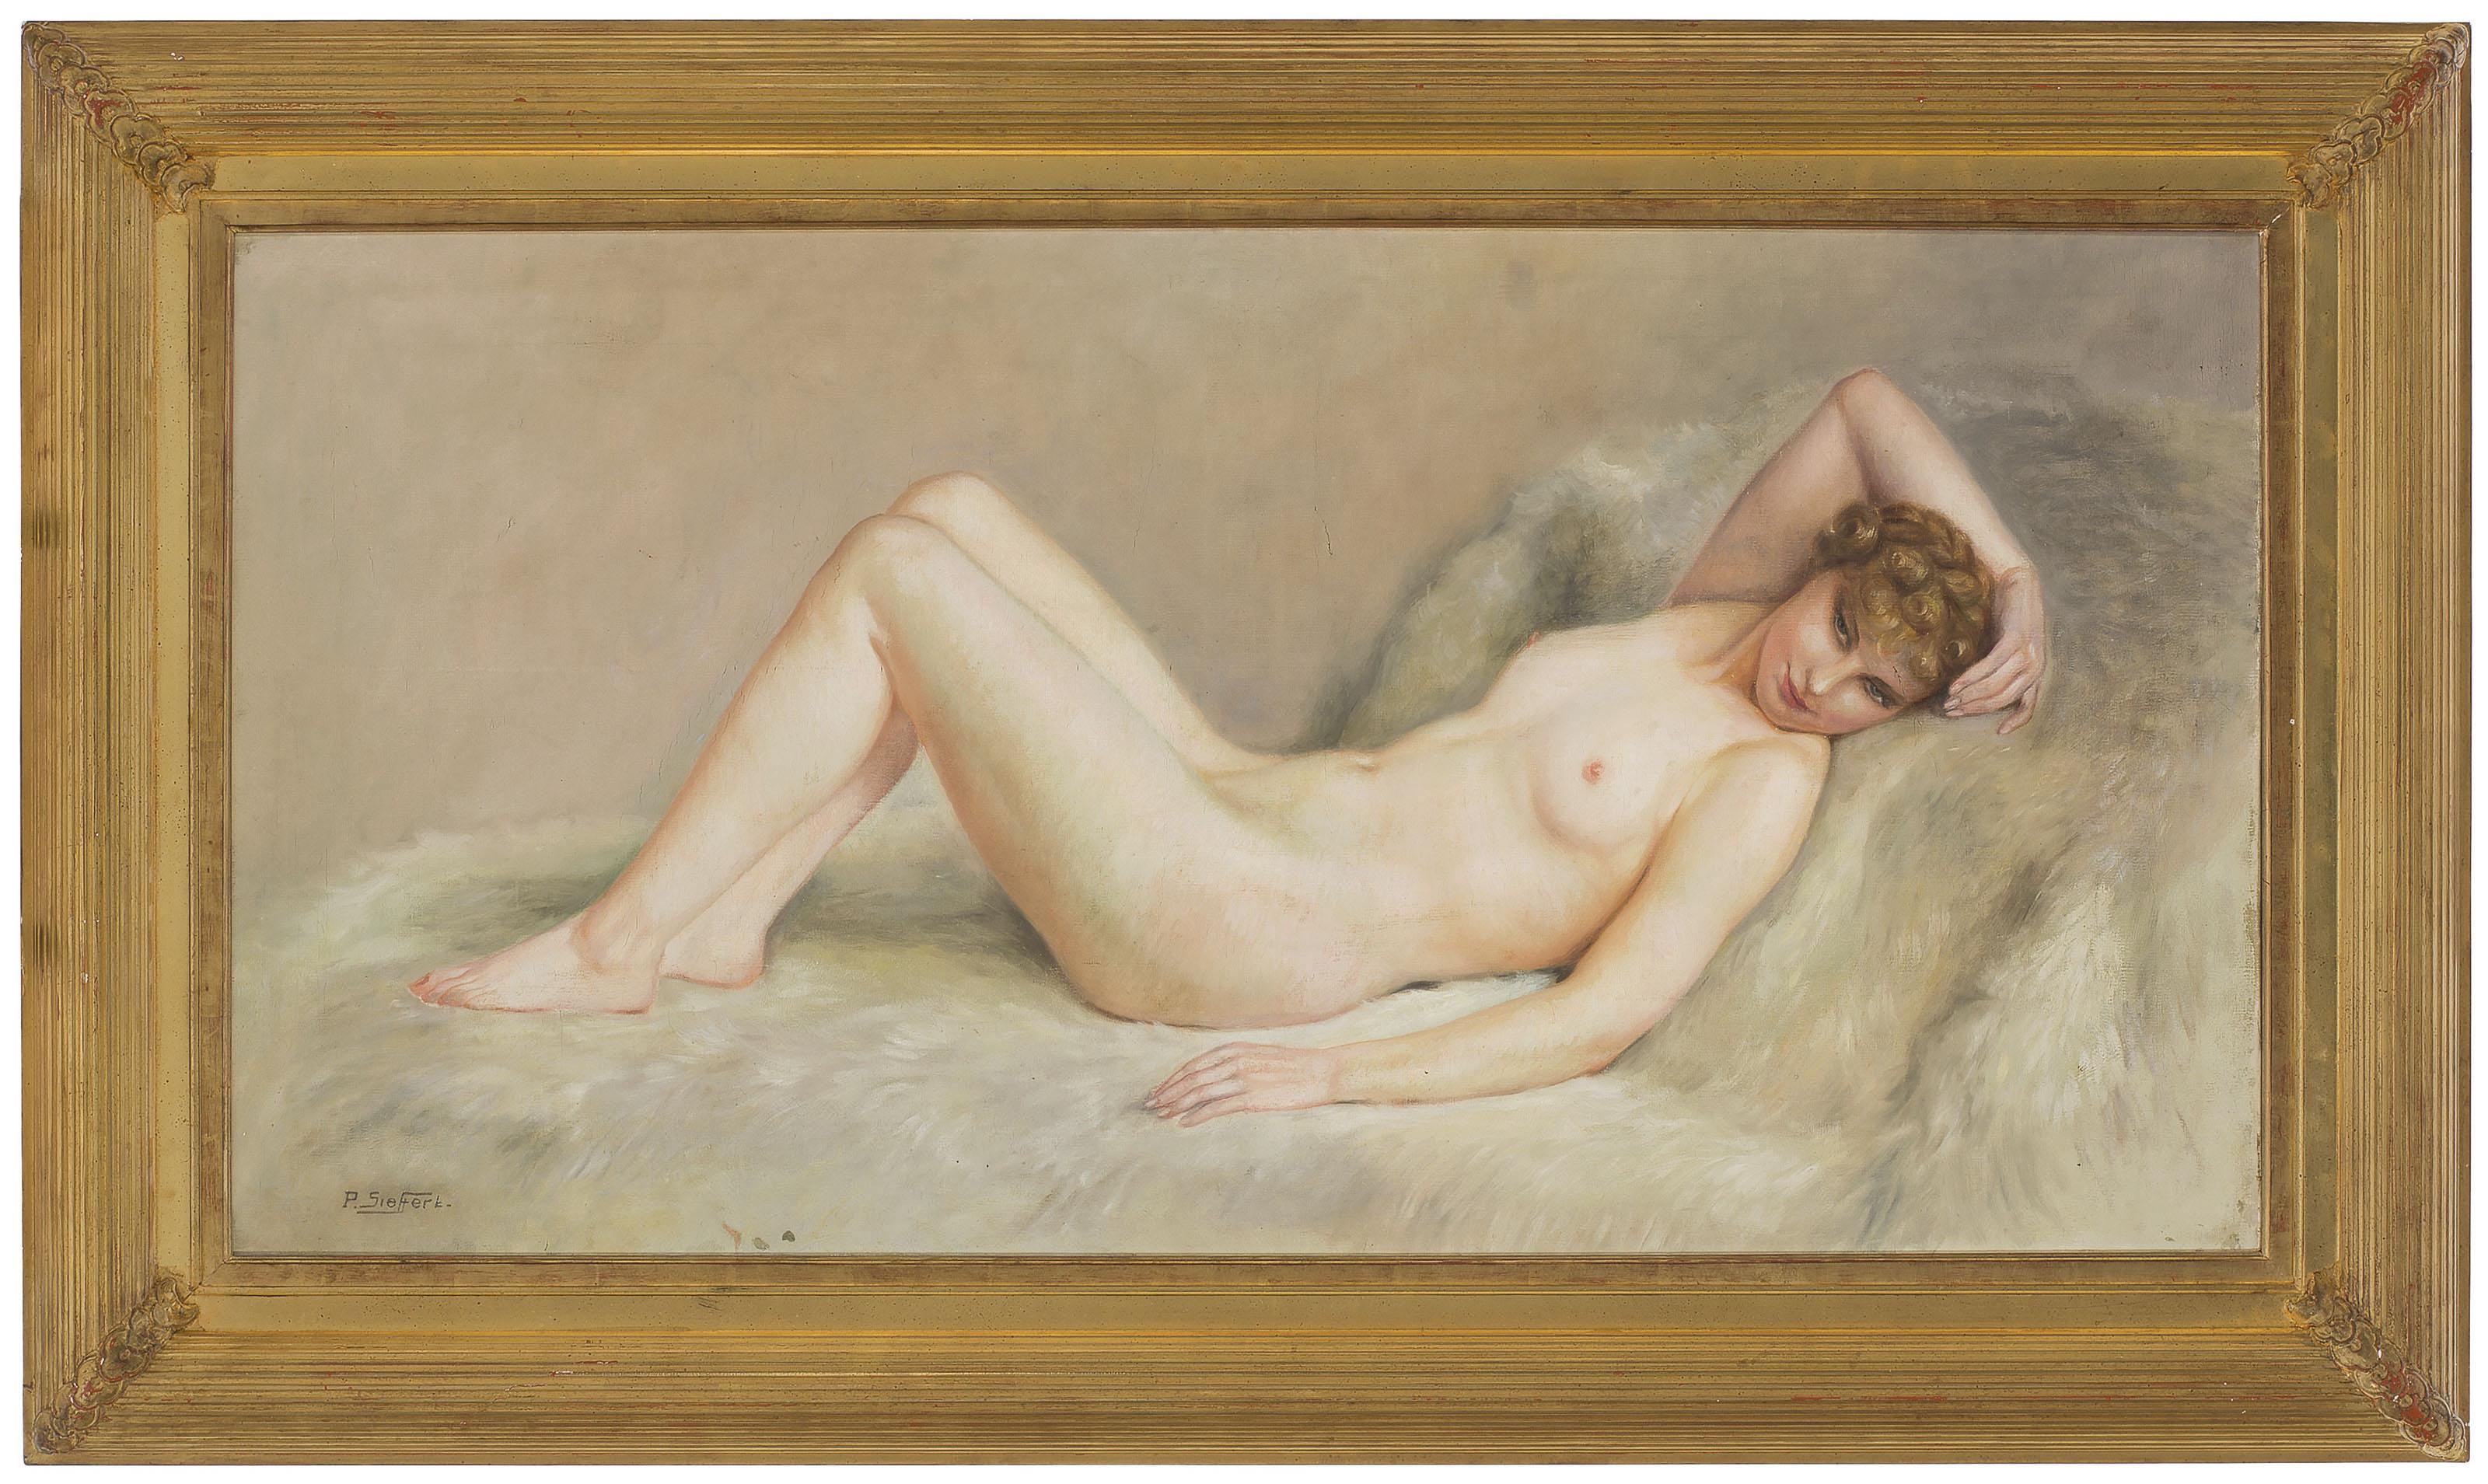 Paul Sieffert (French, 1874–19